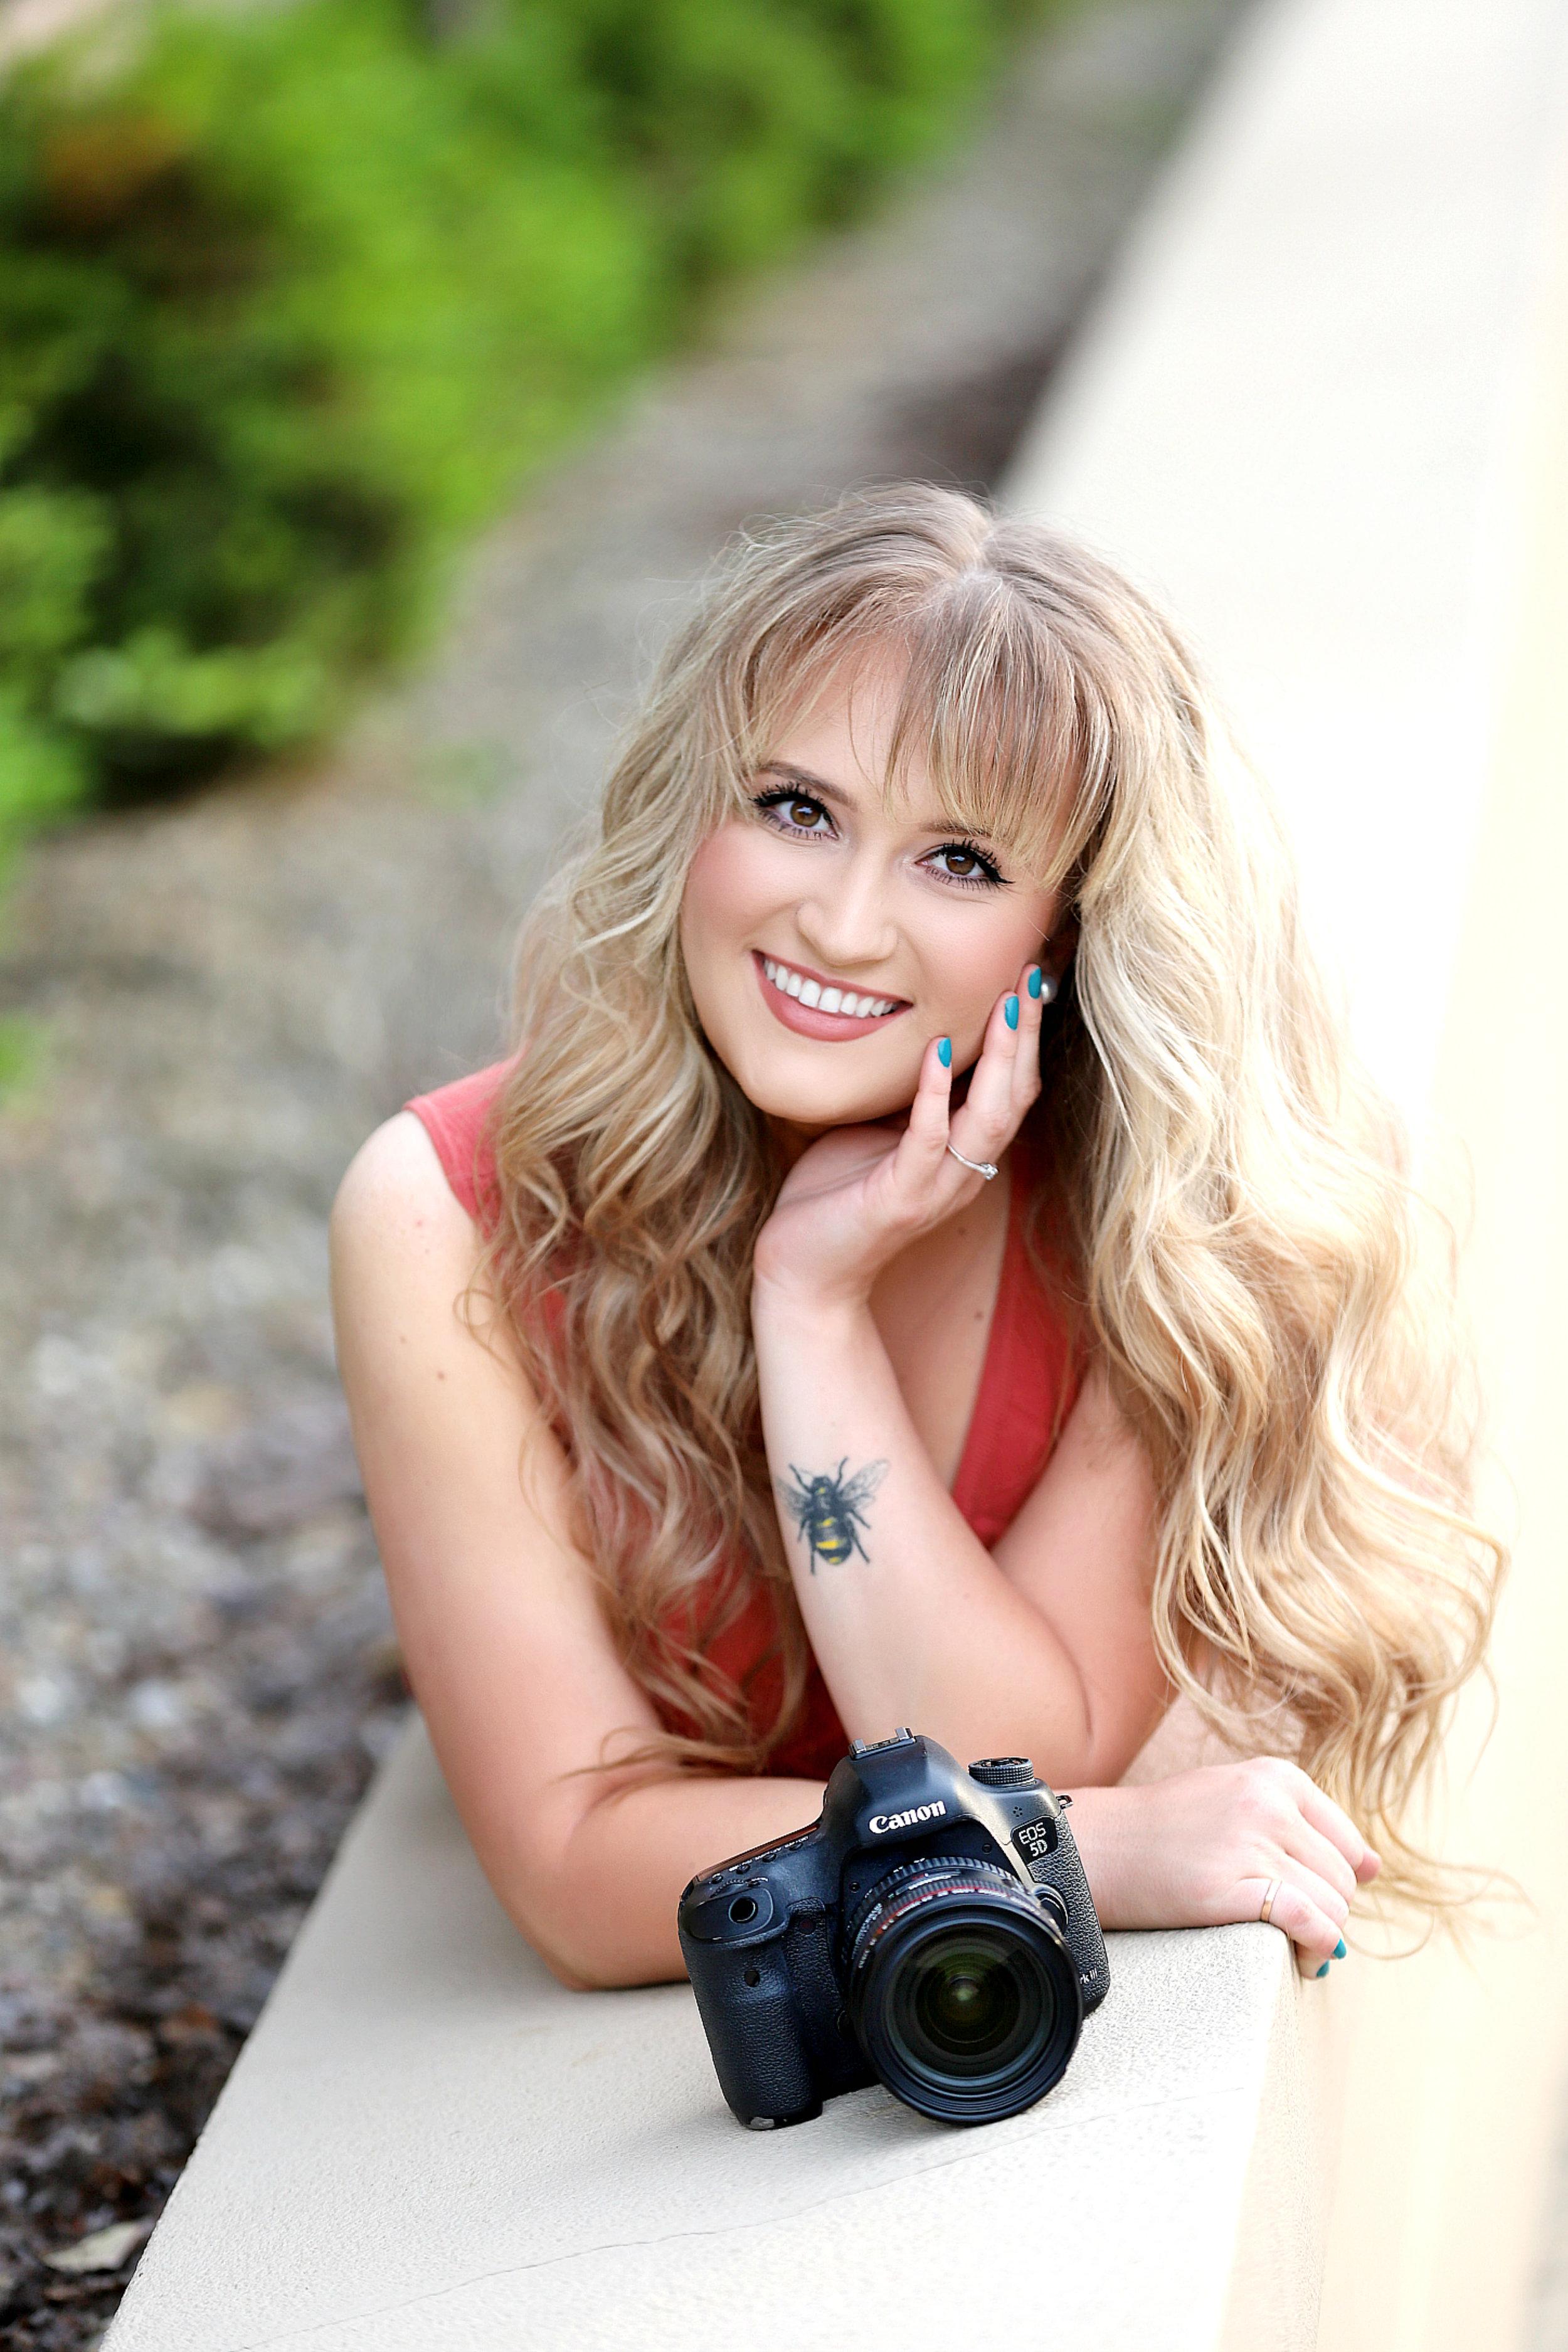 BrittanyBaileyPhotography-SummerHeadshot-1.jpg